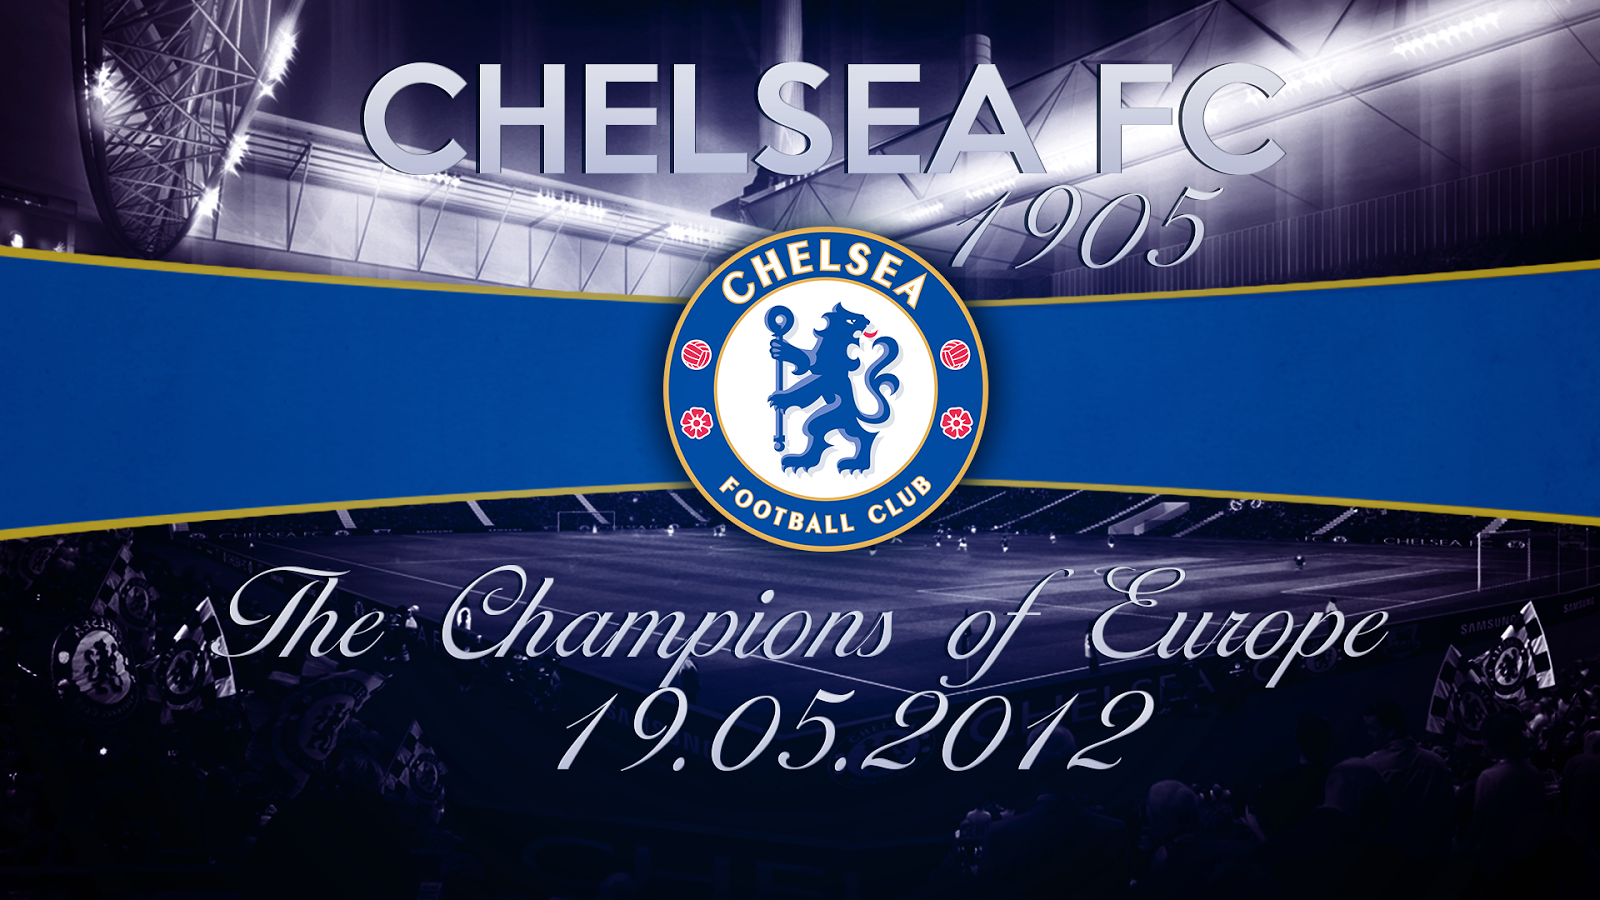 Chelsea Football Club Wallpaper   Football Wallpaper HD 1600x900